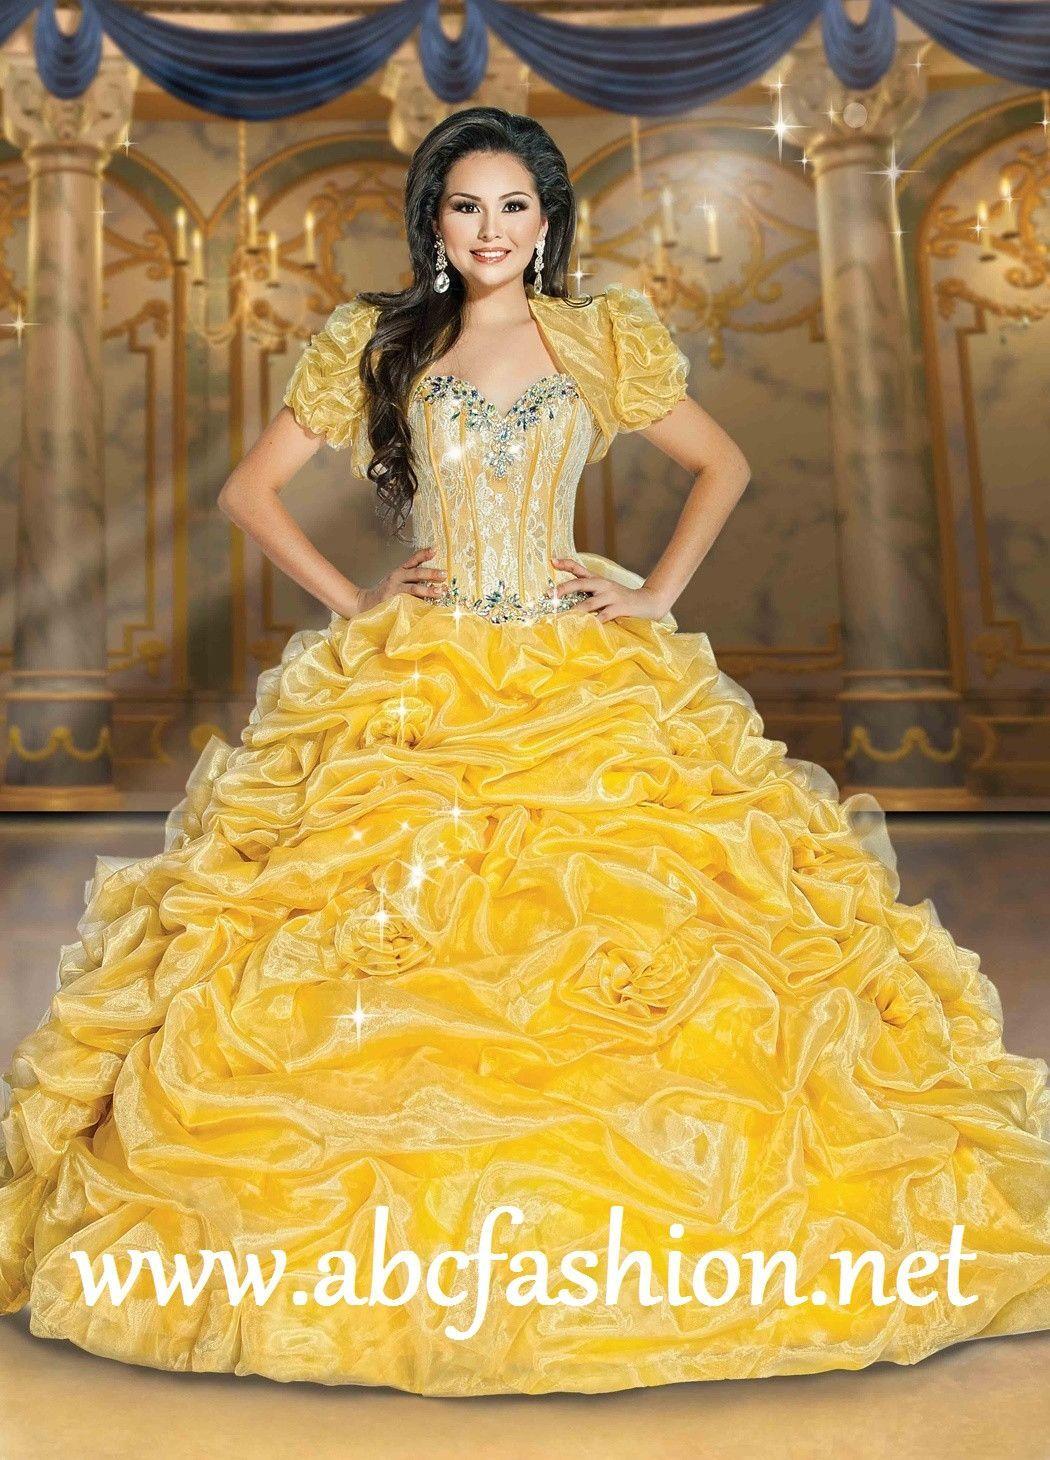 Disney royal ball quinceanera dress belle style dream